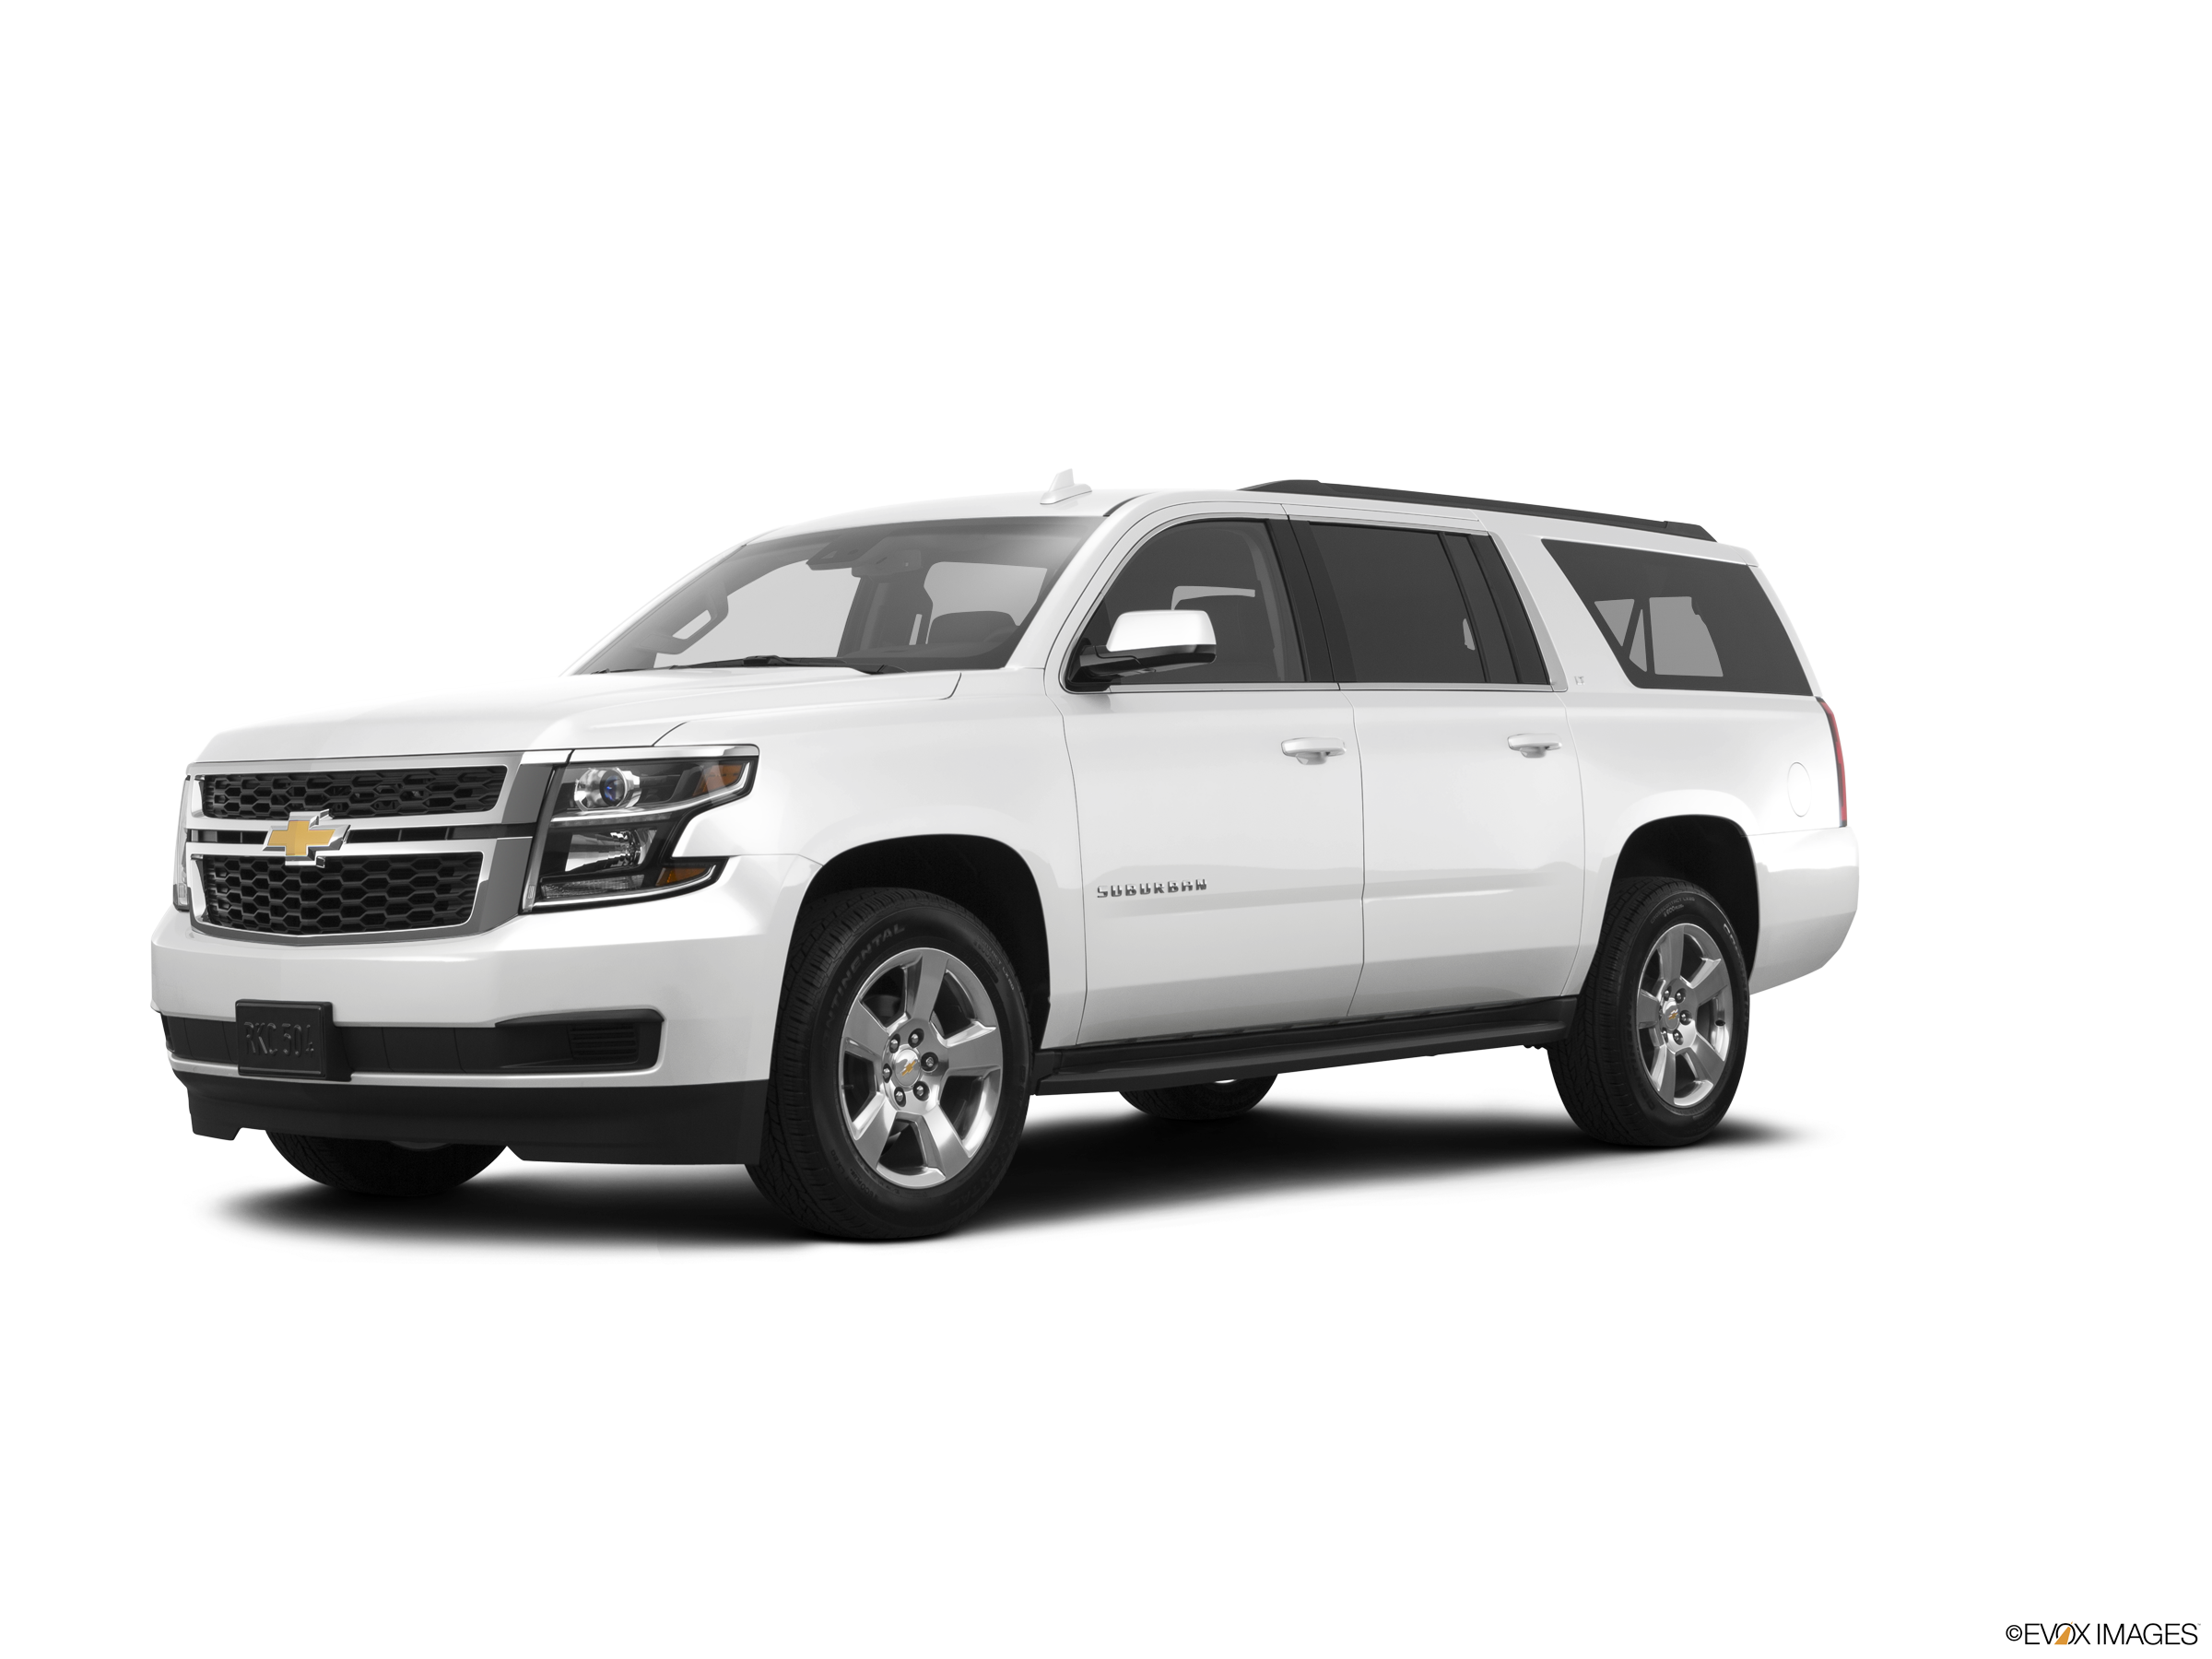 2016 Chevrolet Suburban Values Cars For Sale Kelley Blue Book